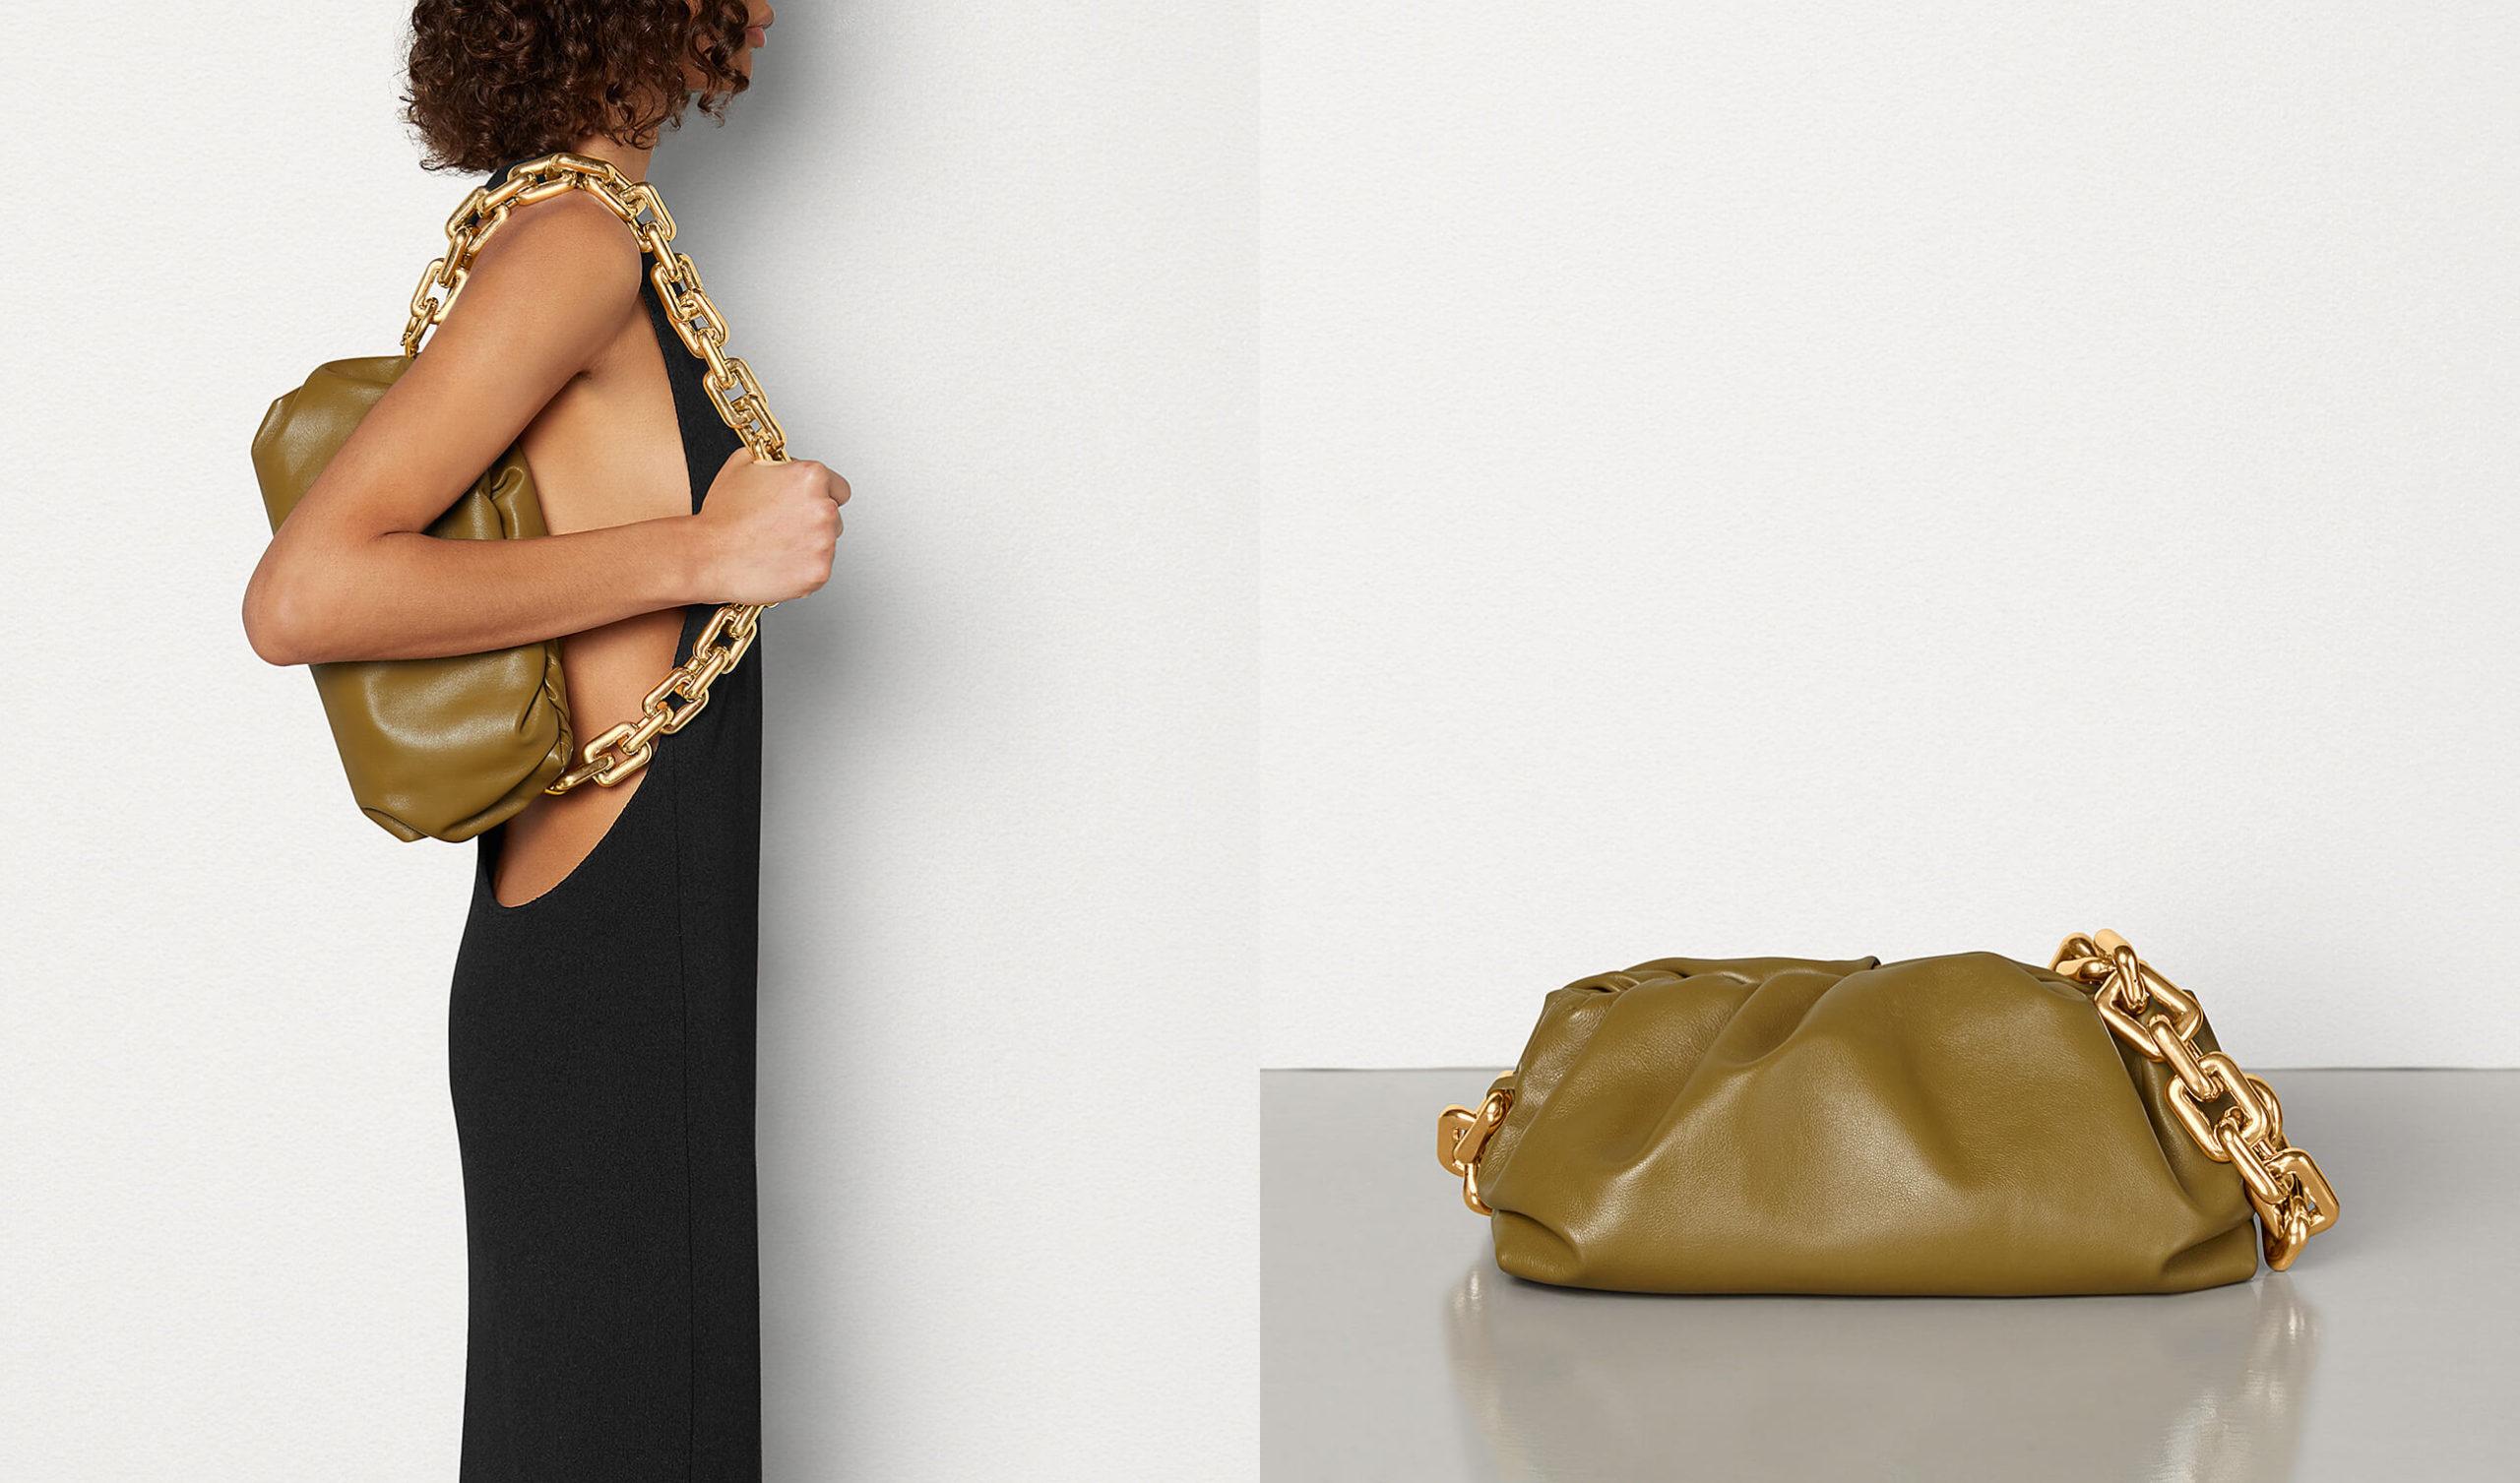 Bottega Veneta chain pouch my least favorite one